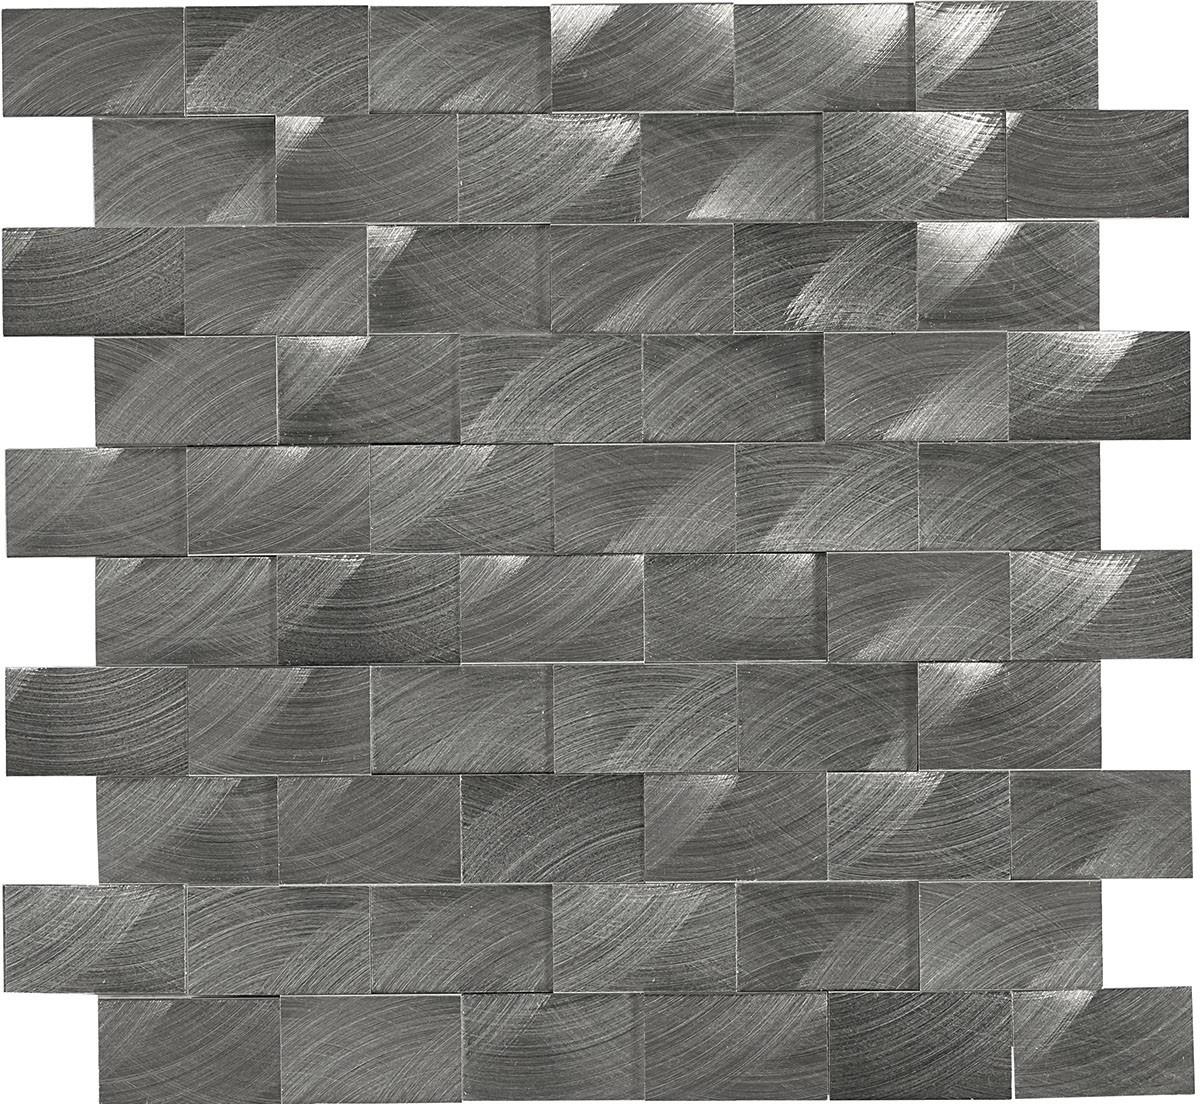 ST72 Gunmetal Mosaic 3d brick joint